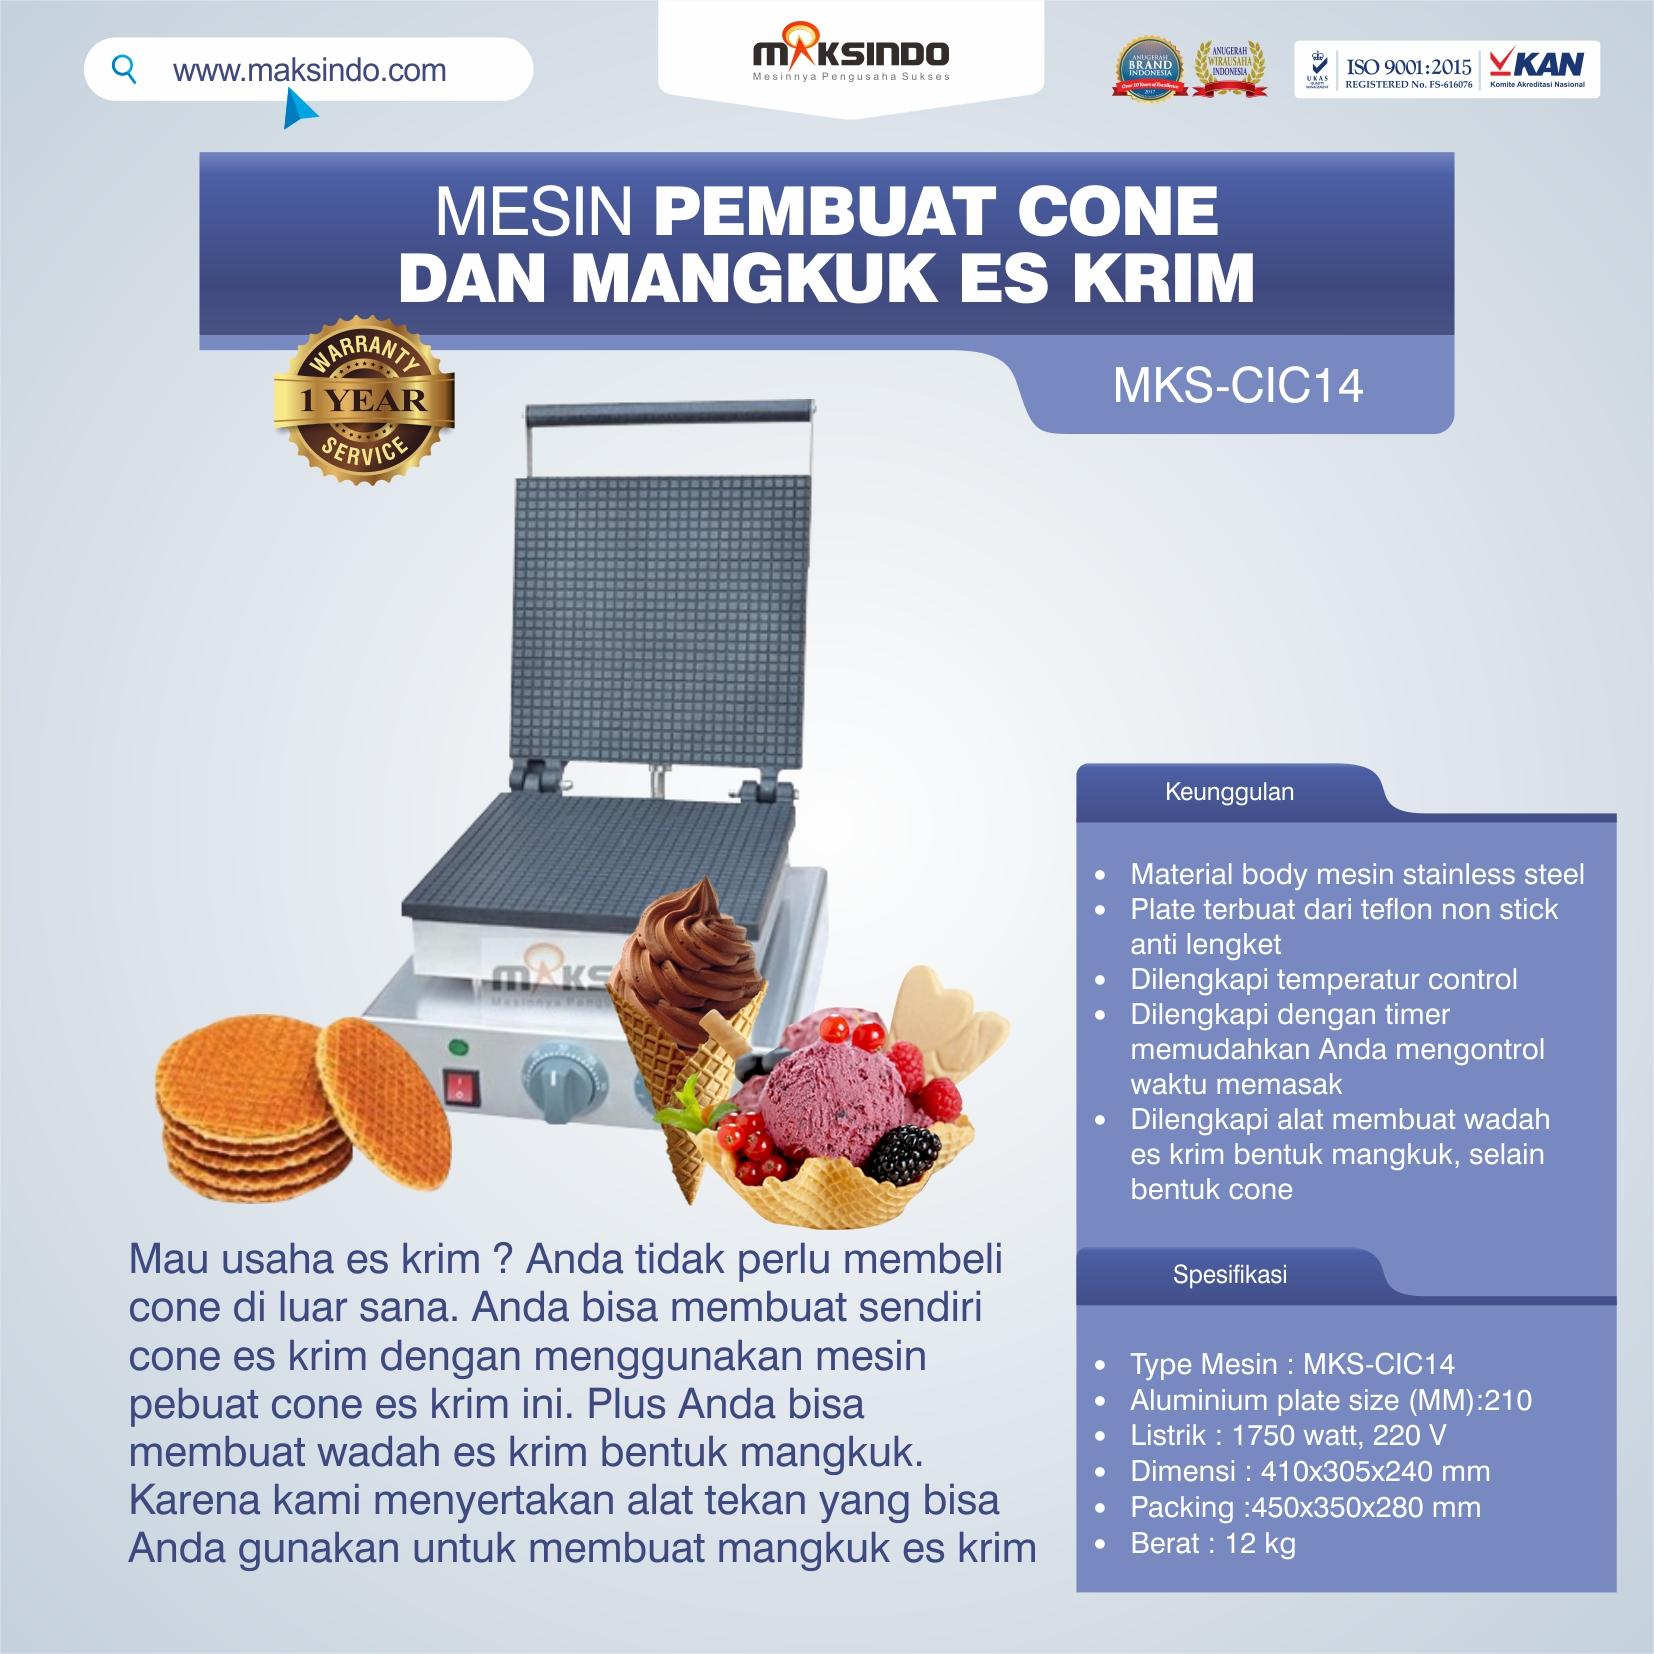 Jual Pembuat Cone dan Mangkuk Es Krim (CIC14) di Yogyakarta